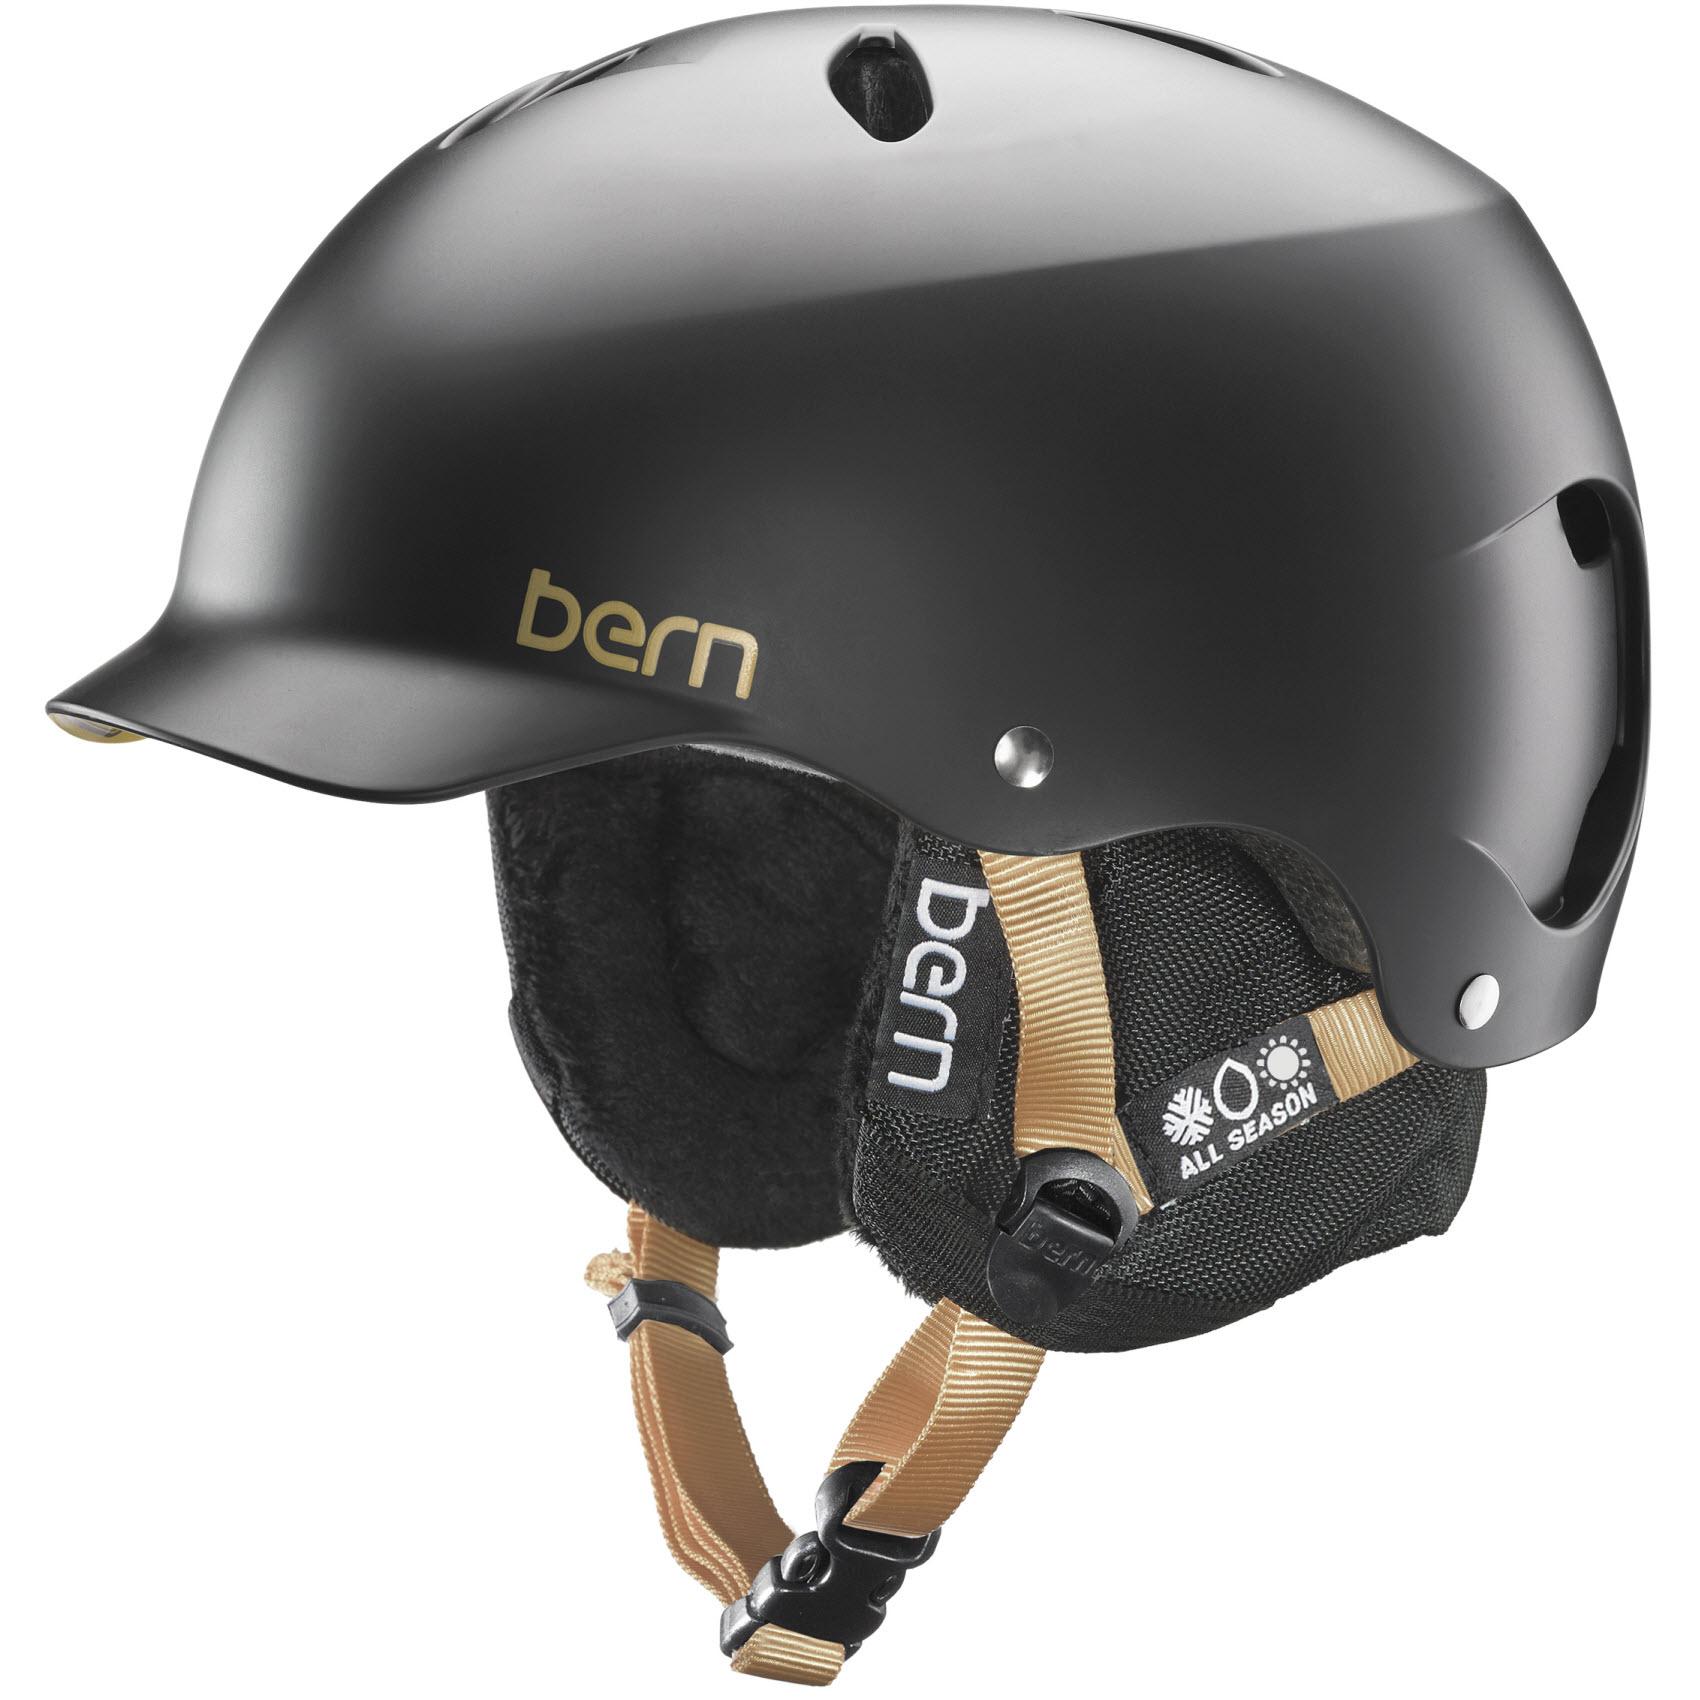 Bern Lenox EPS Womens Snowboard Ski Helmet 2015